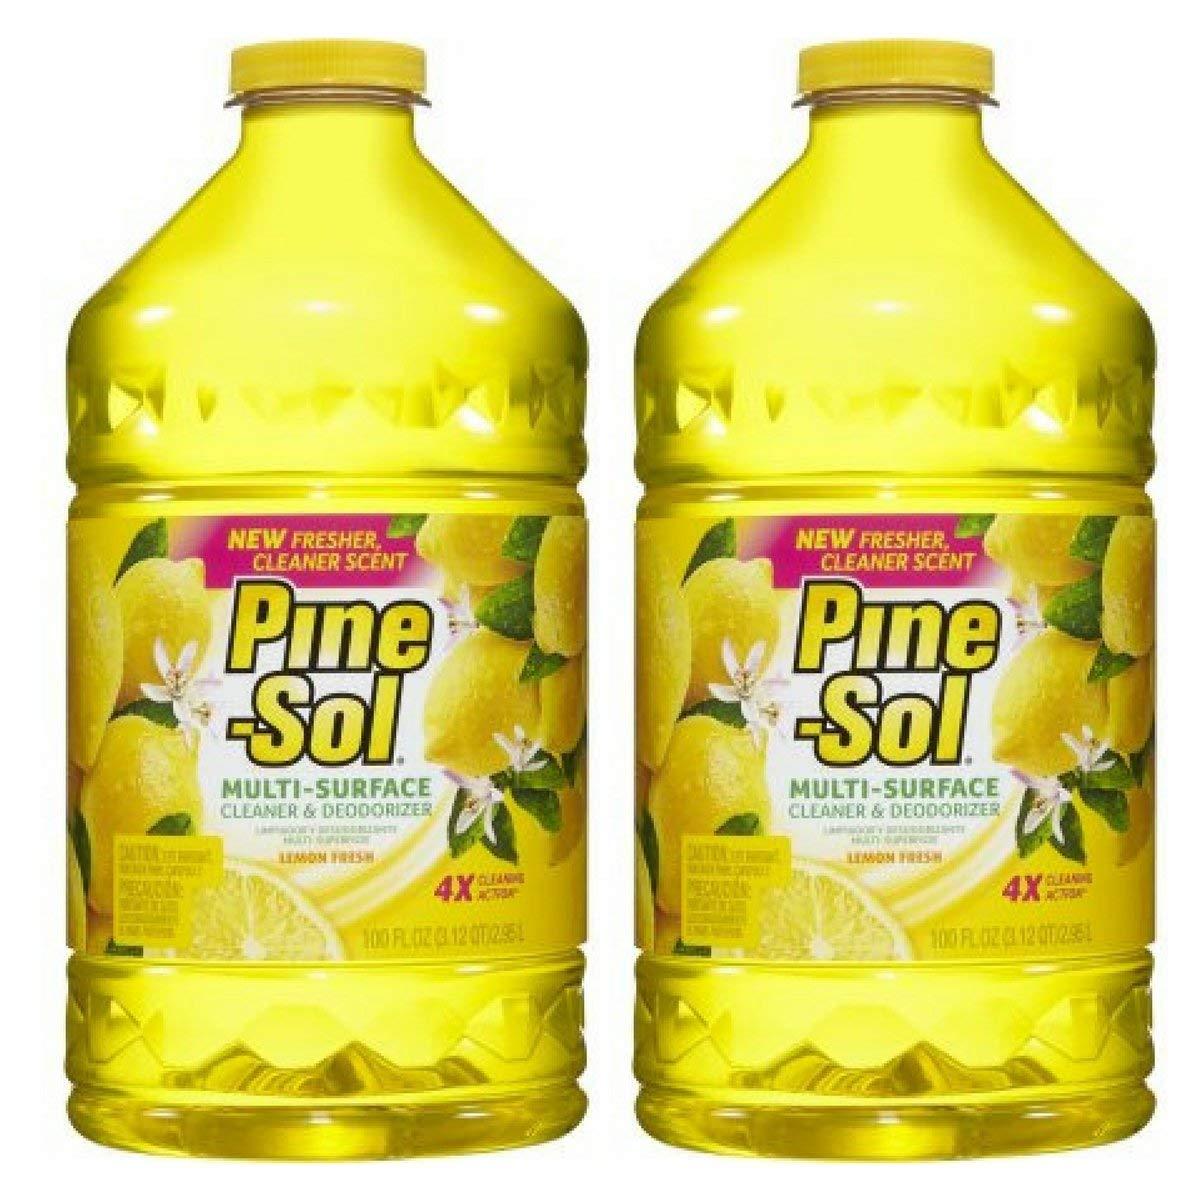 pine-sol Multi - Surface Cleaner、レモンフレッシュ、100 oz – パックof 2 B07BBQPT38